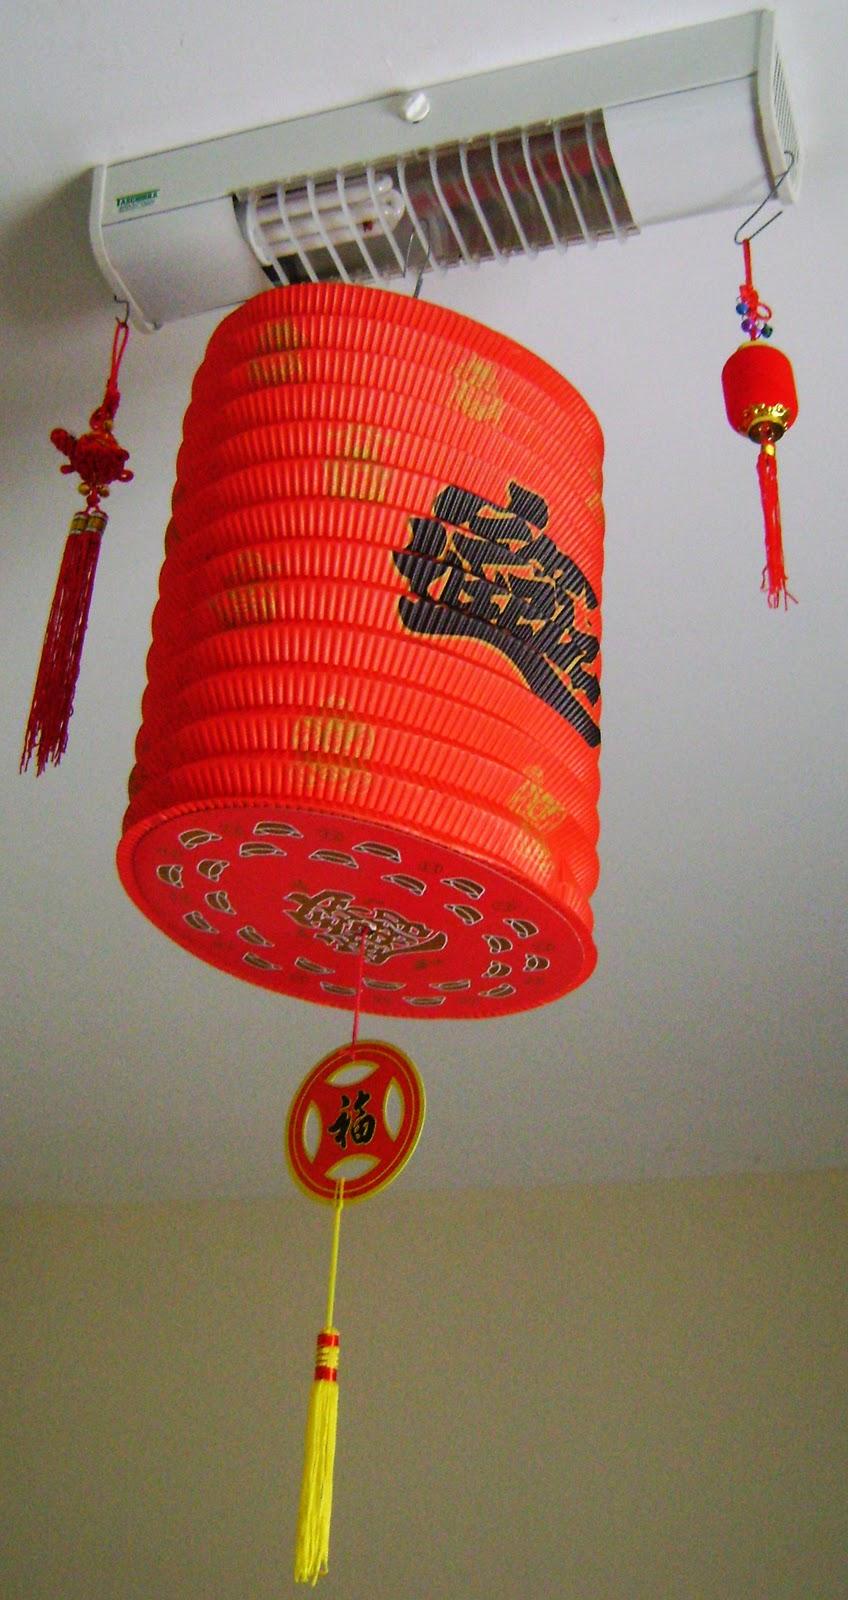 bairro, liberdade, são paulo, japão, japoneses, lanterna japonesa